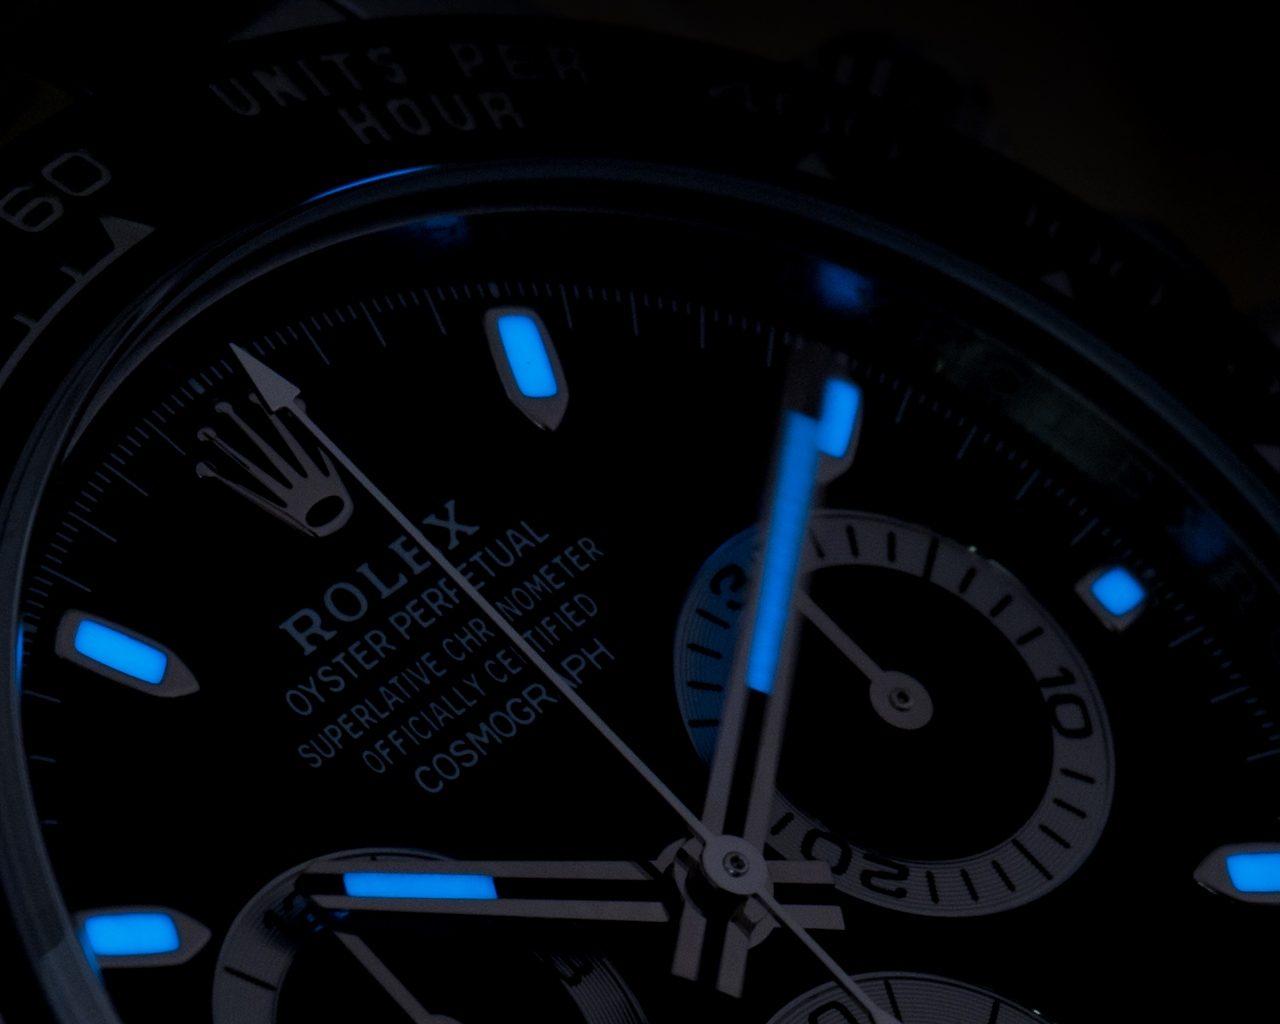 watch-test-rolex-daytona-116500ln-acciaio-con-lunetta-in-cerachrom-nera-prezzo-price_0-10025